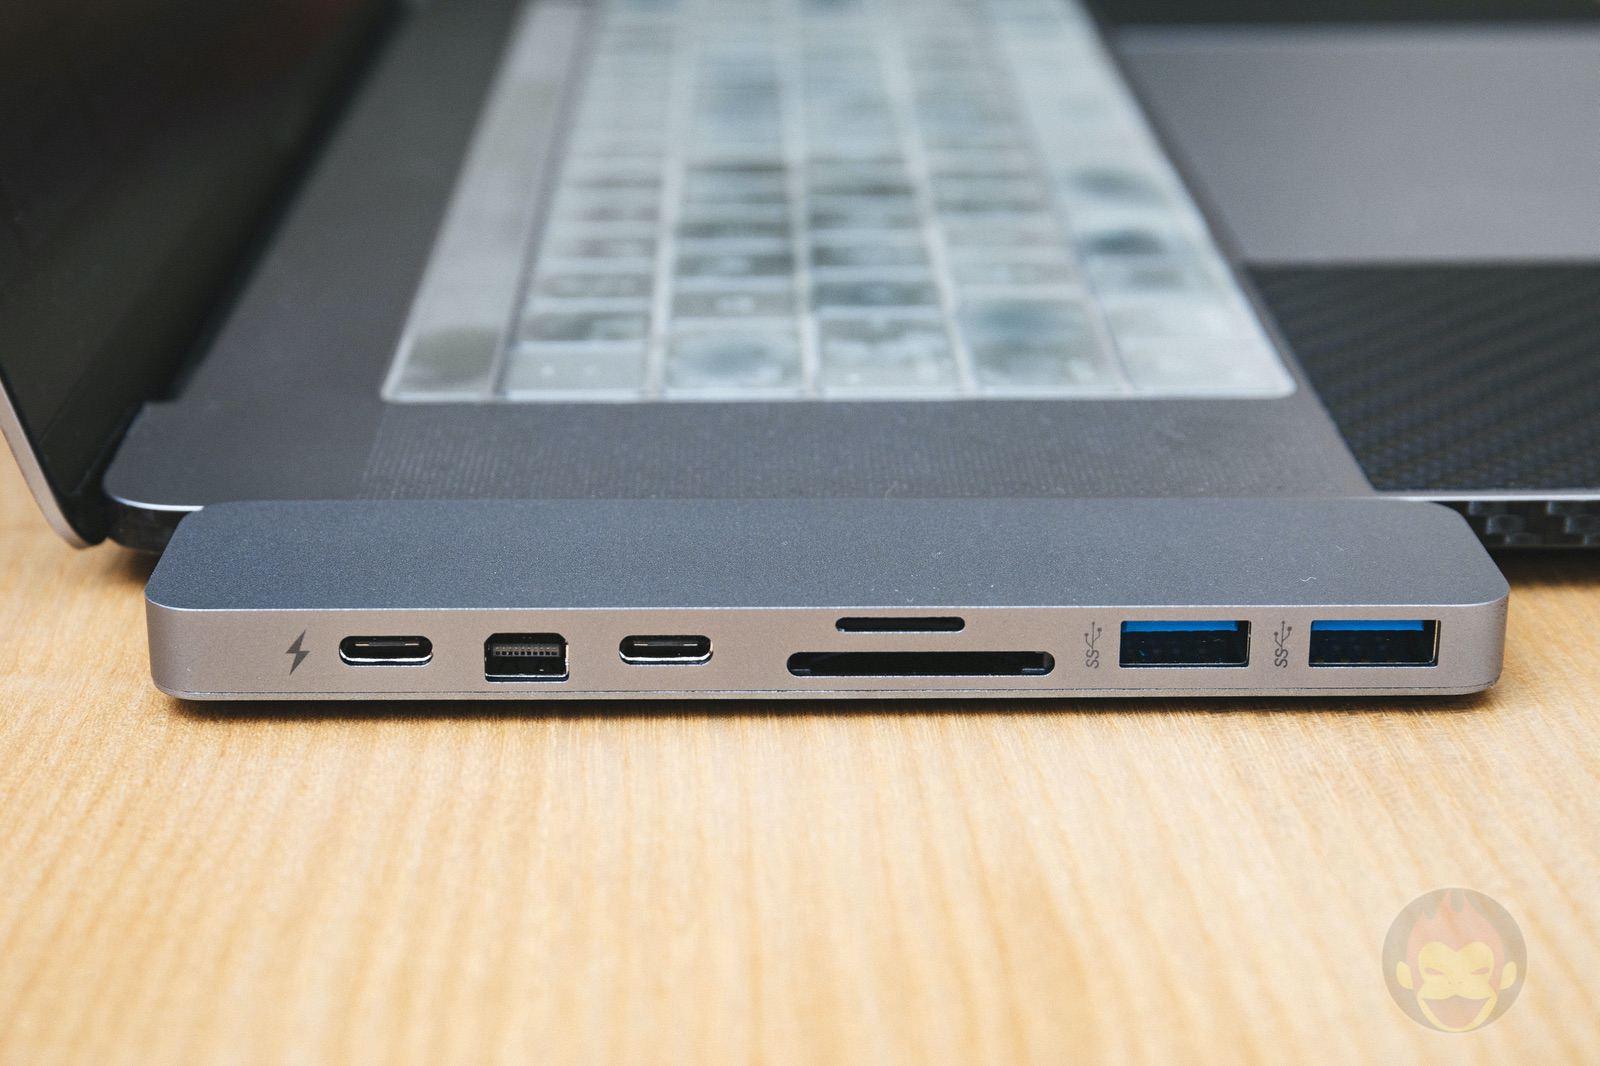 HyperDrive PRO USBC Hub 04